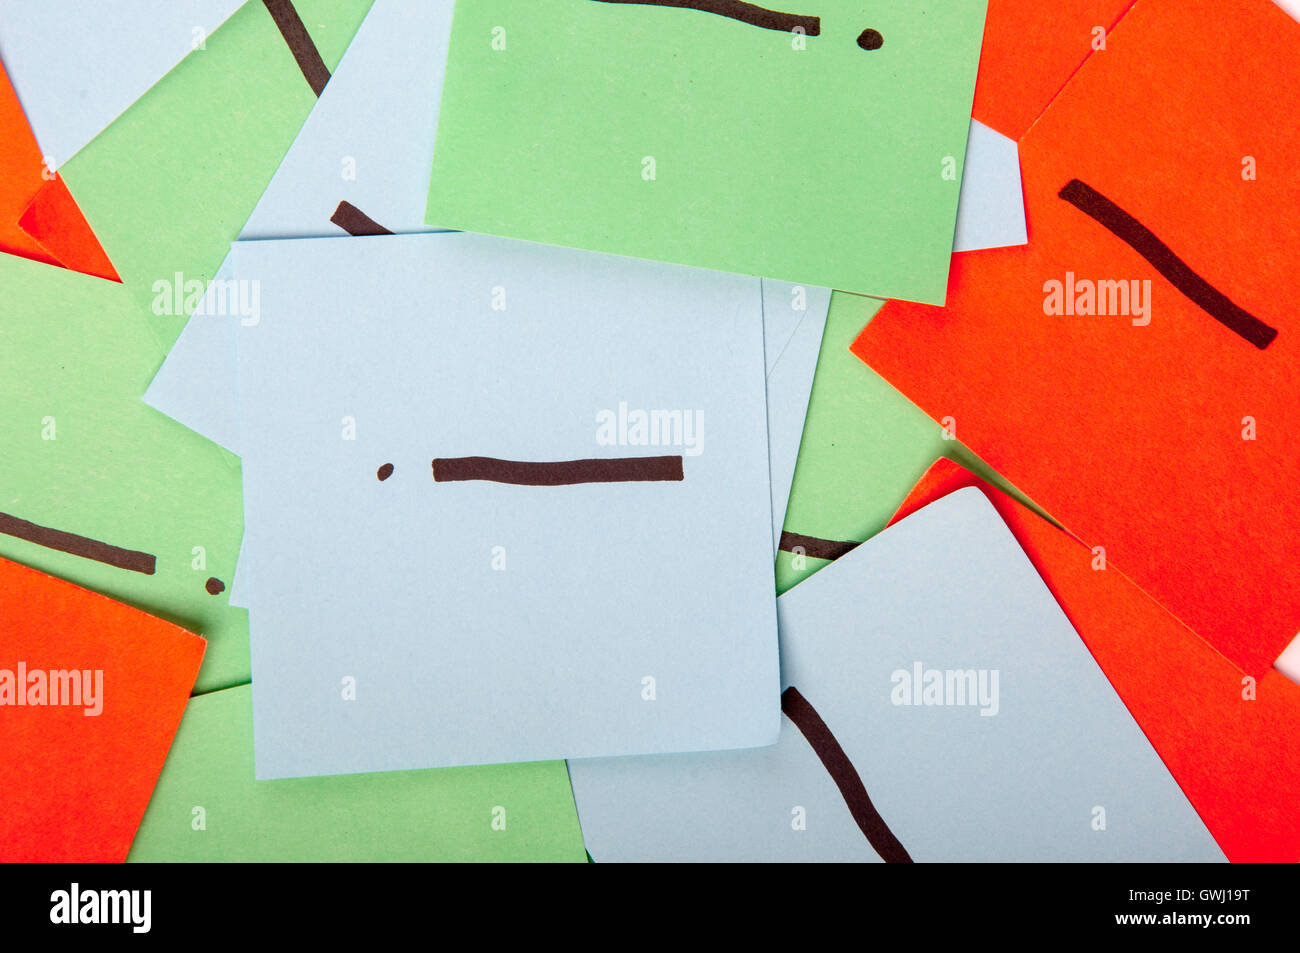 Interjection Imágenes De Stock & Interjection Fotos De Stock - Alamy